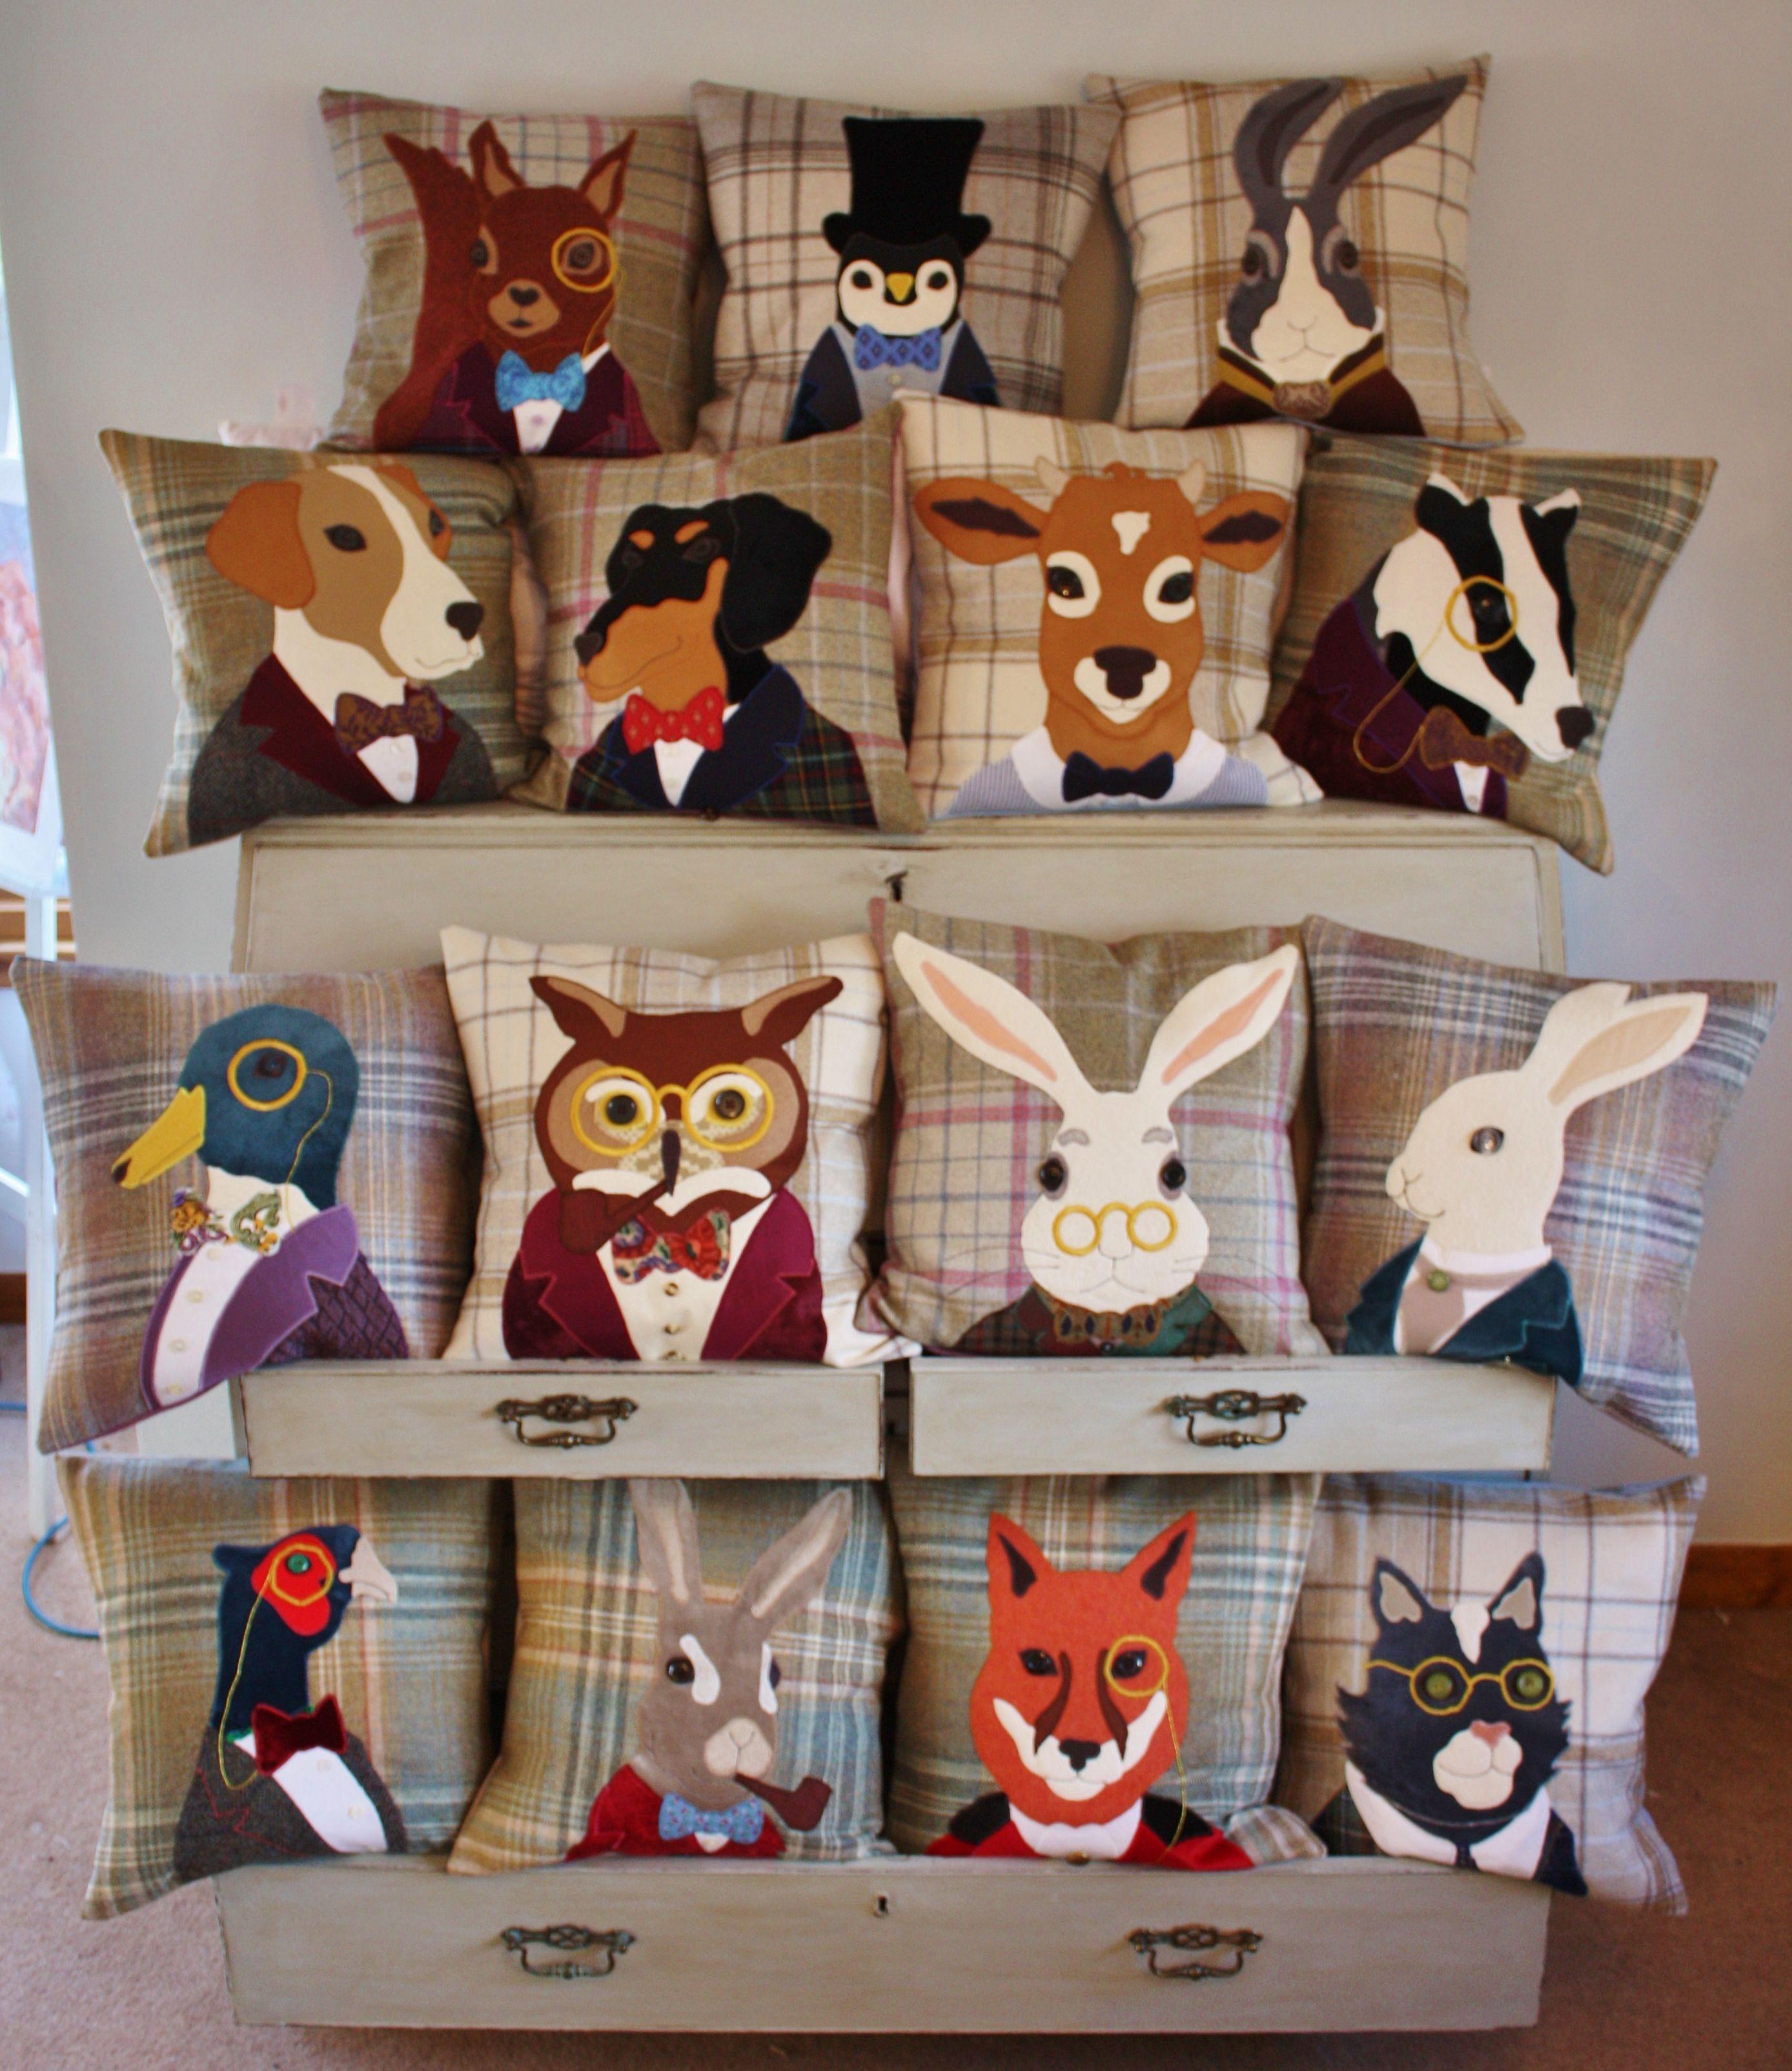 Handmade Animal Cushions Fiber and Fabric Pinterest Animal cushions, Animal and Pillows